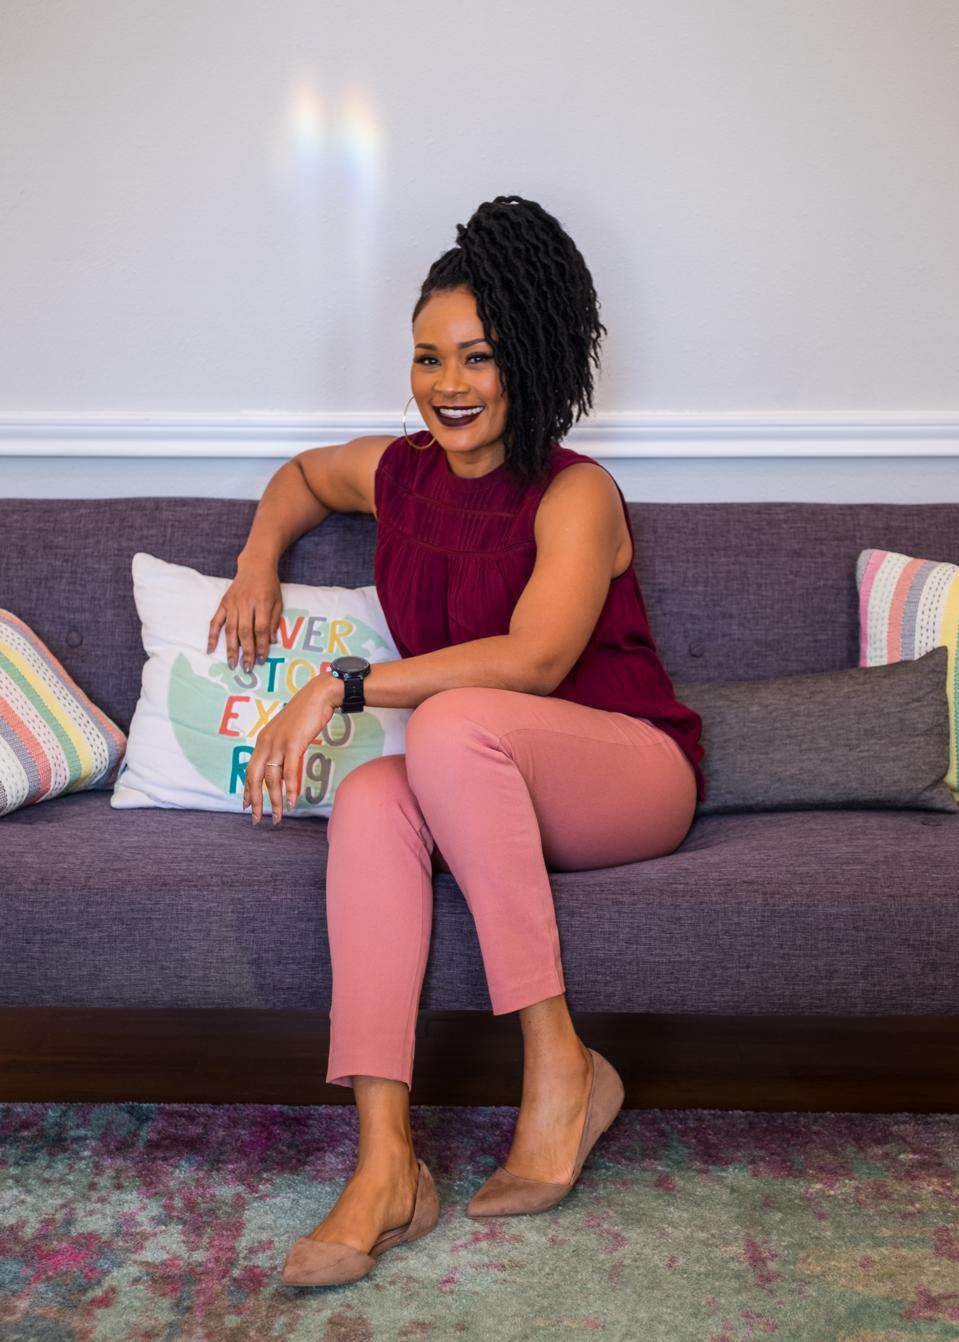 Dr. Ebony Butler hard at work as a licensed psychologist and food relationship strategist